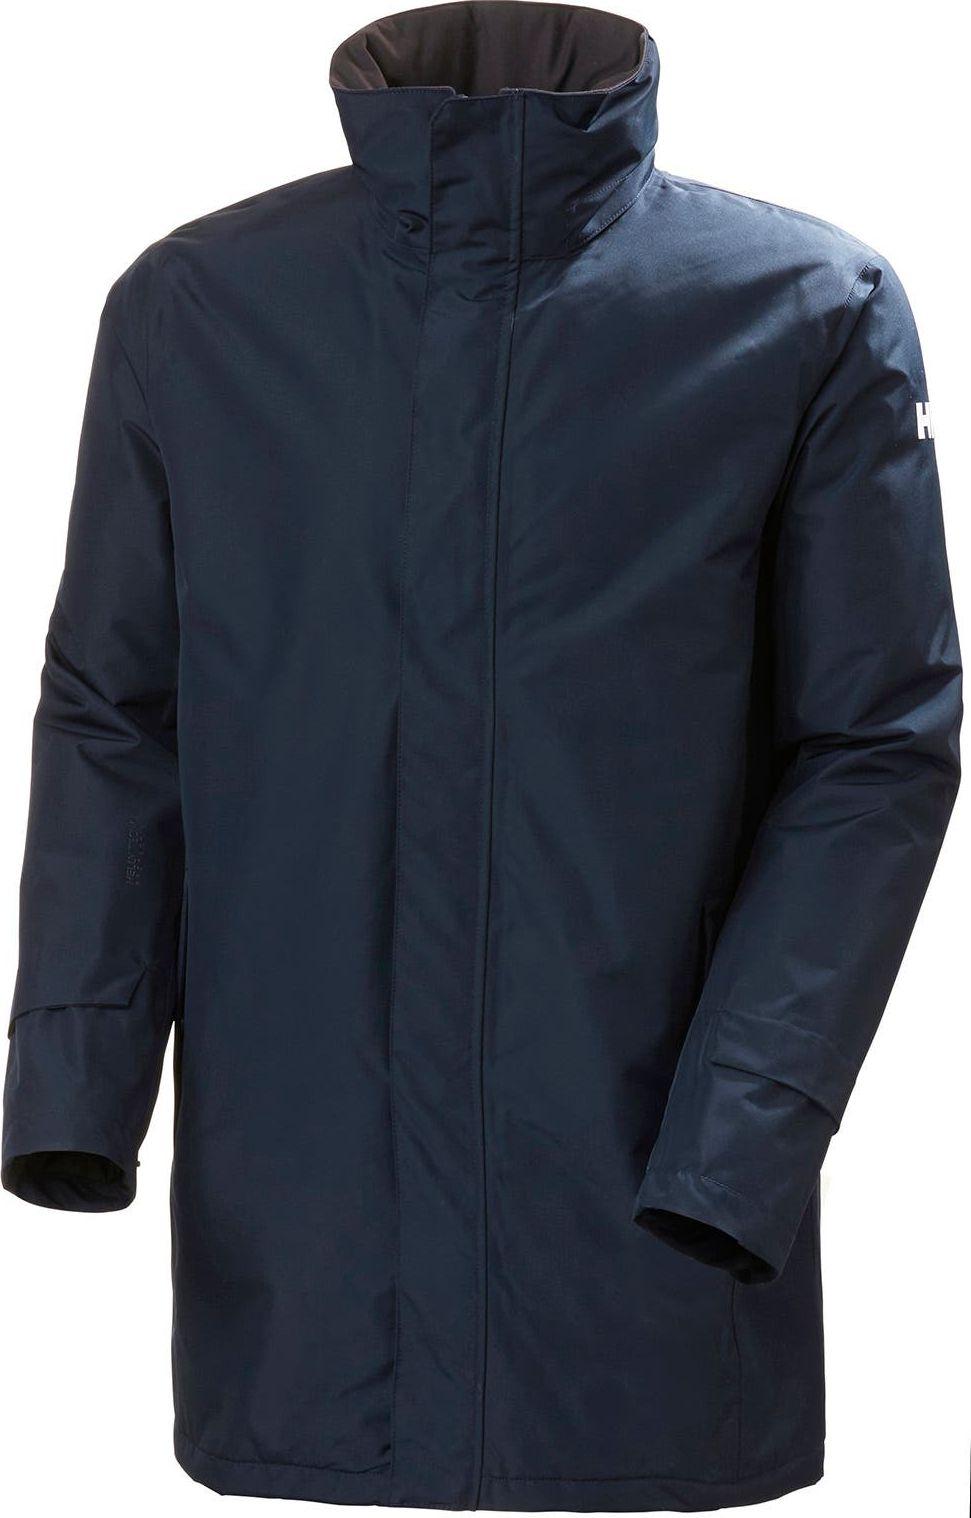 HELLY HANSEN Dubliner Insulated Long Jacket Men's Navy M